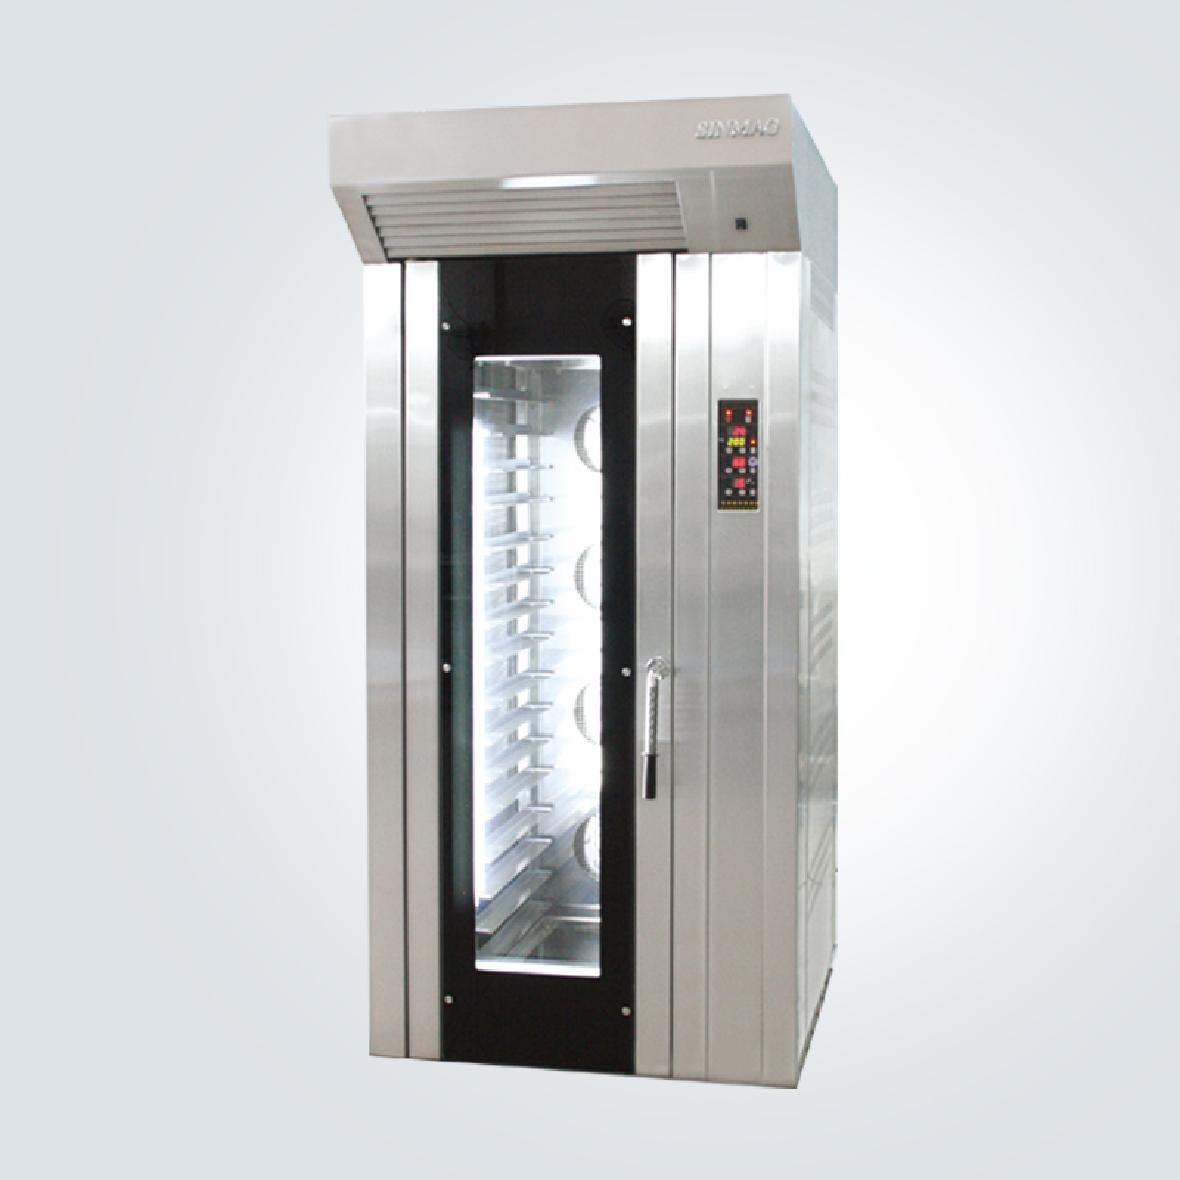 台車式熱風爐 RV1